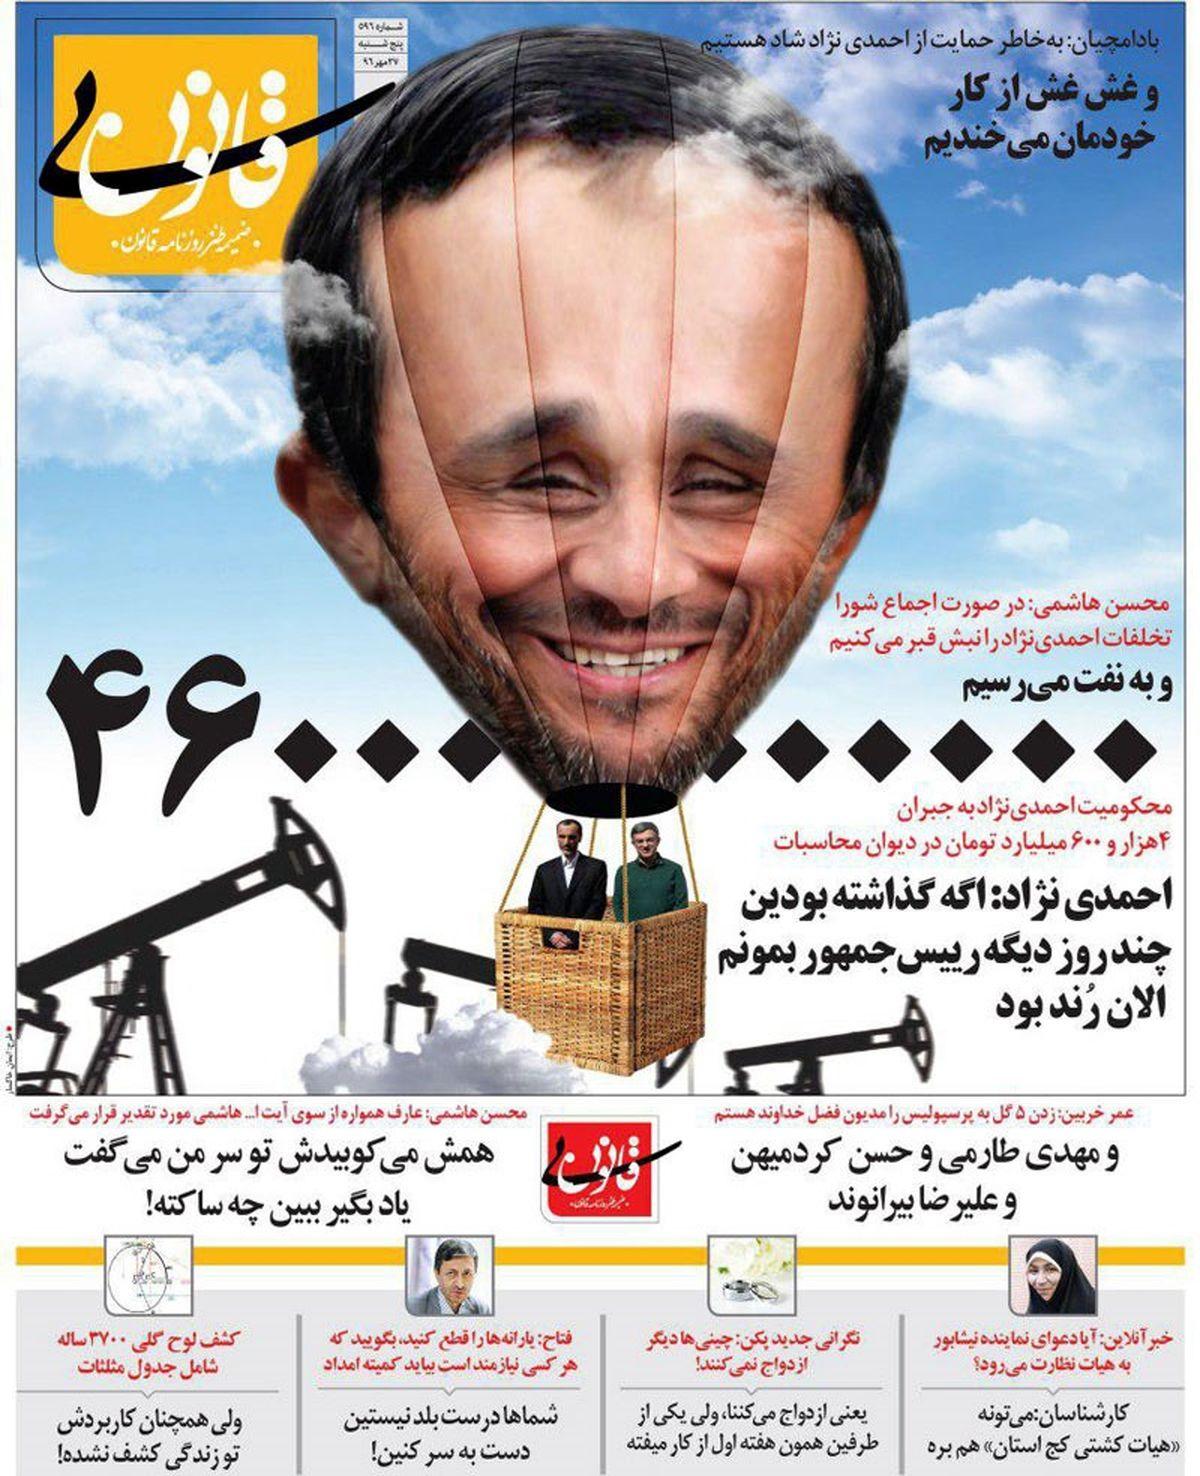 تخلف میلیاردی احمدی نژادی از اون لحاظ! (طنز)